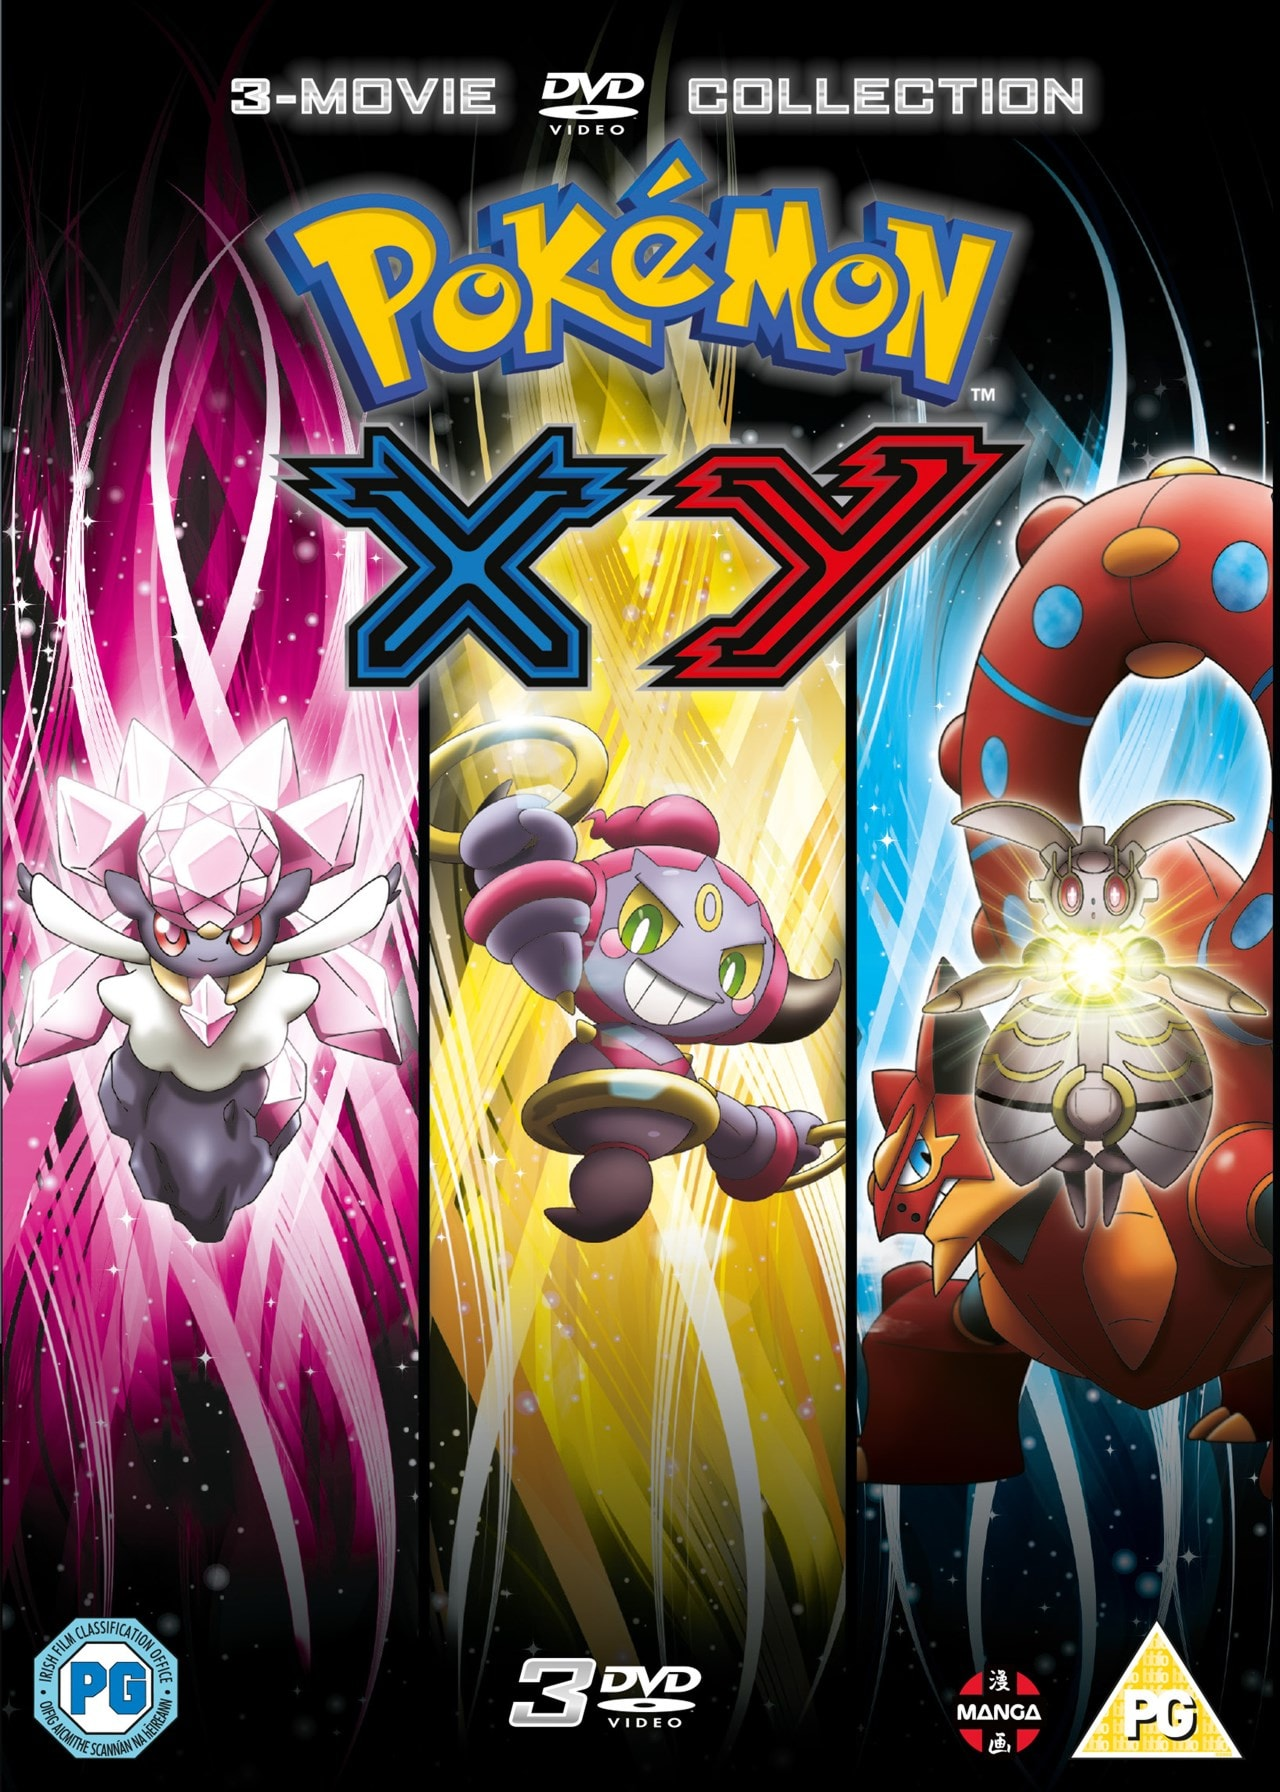 Pokemon: The Movie Collection 17-19 - XY - 1